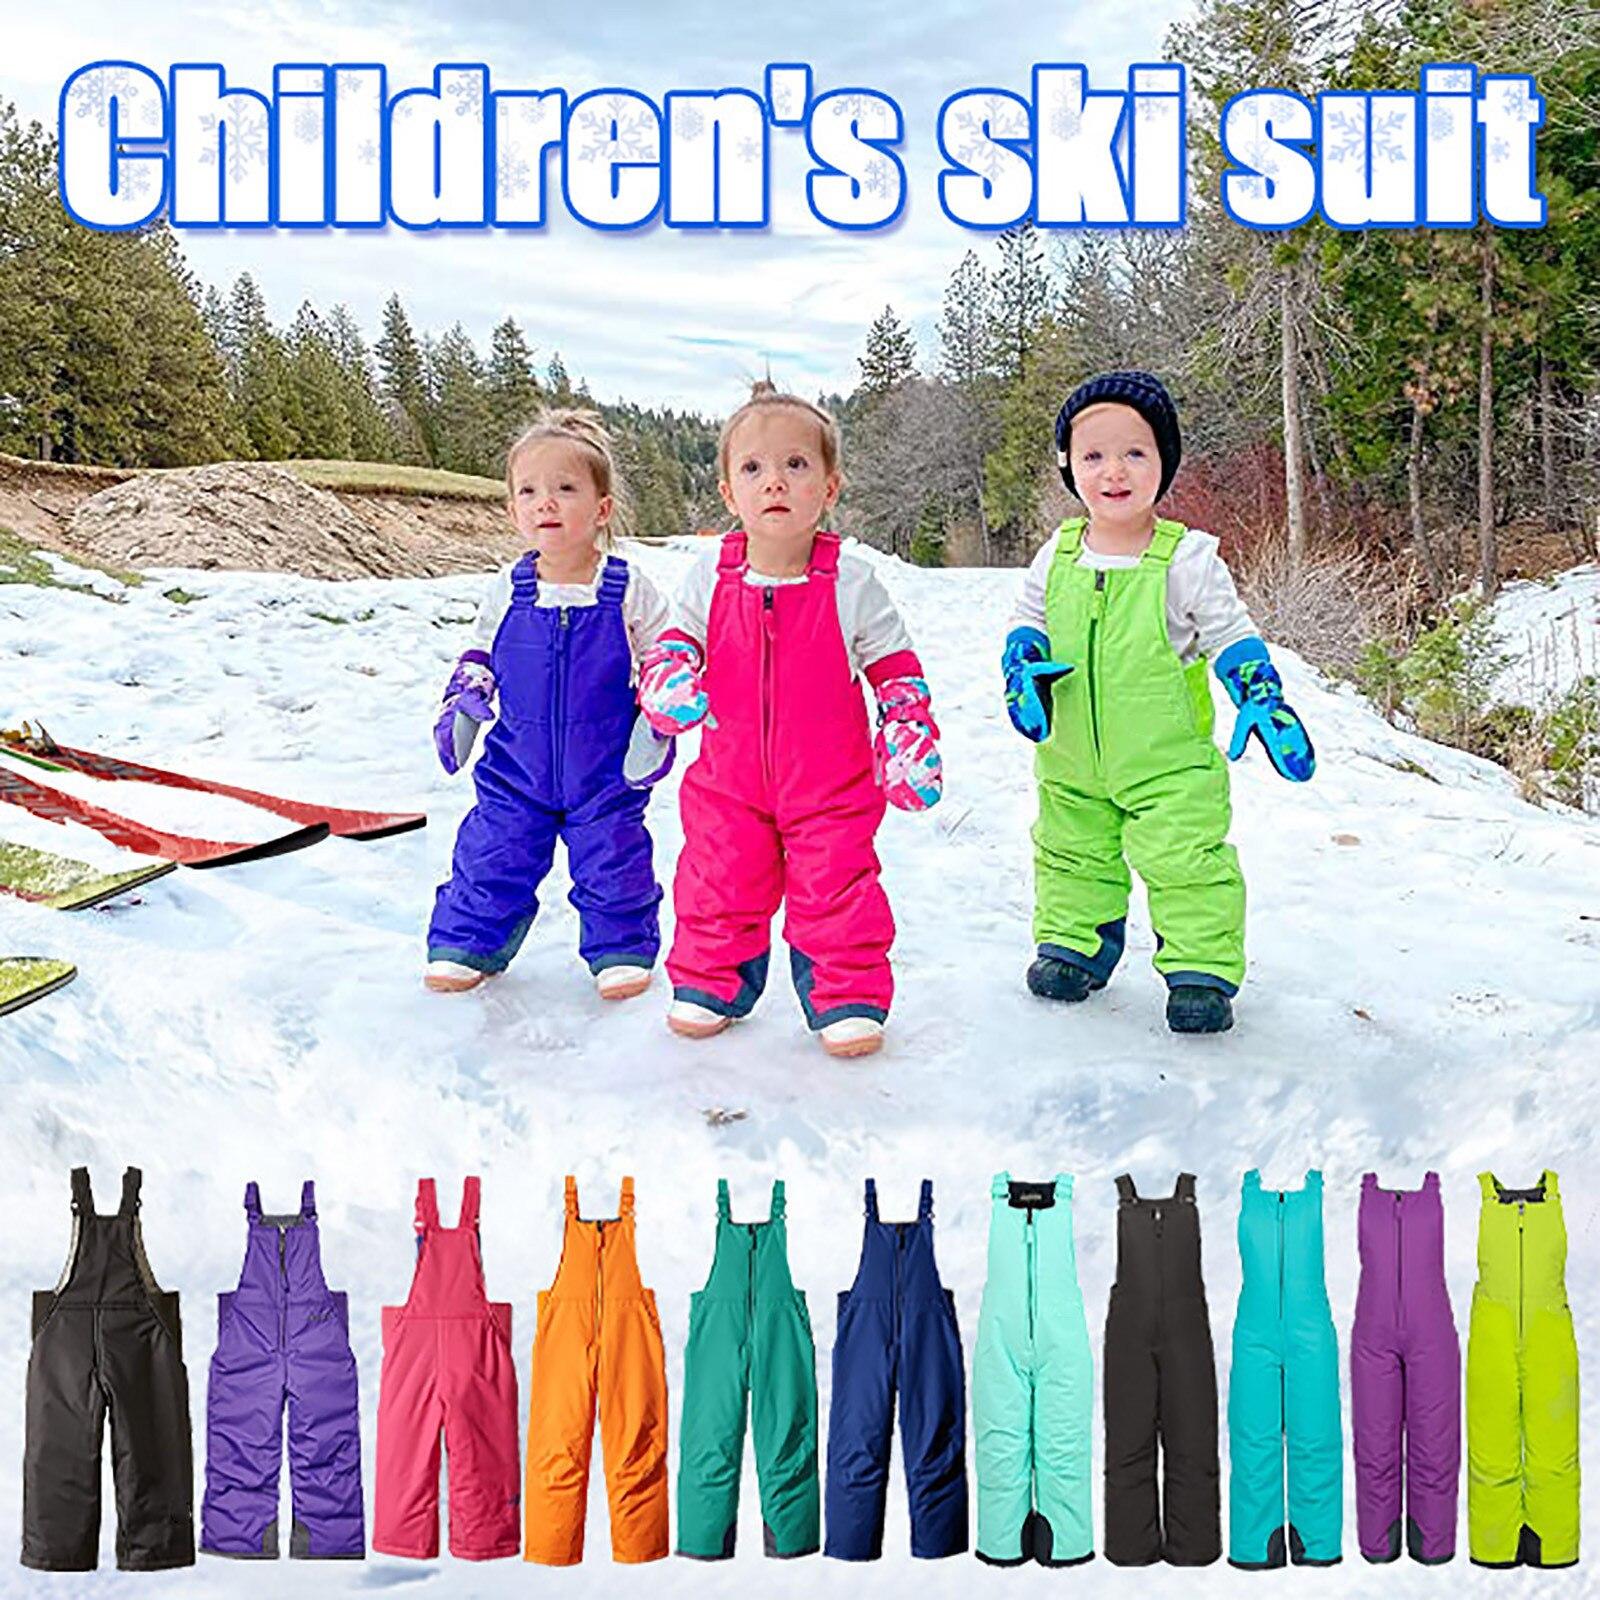 Infant/Child Ski Wear,Infant/Toddler Chest High Snow Bib Overalls